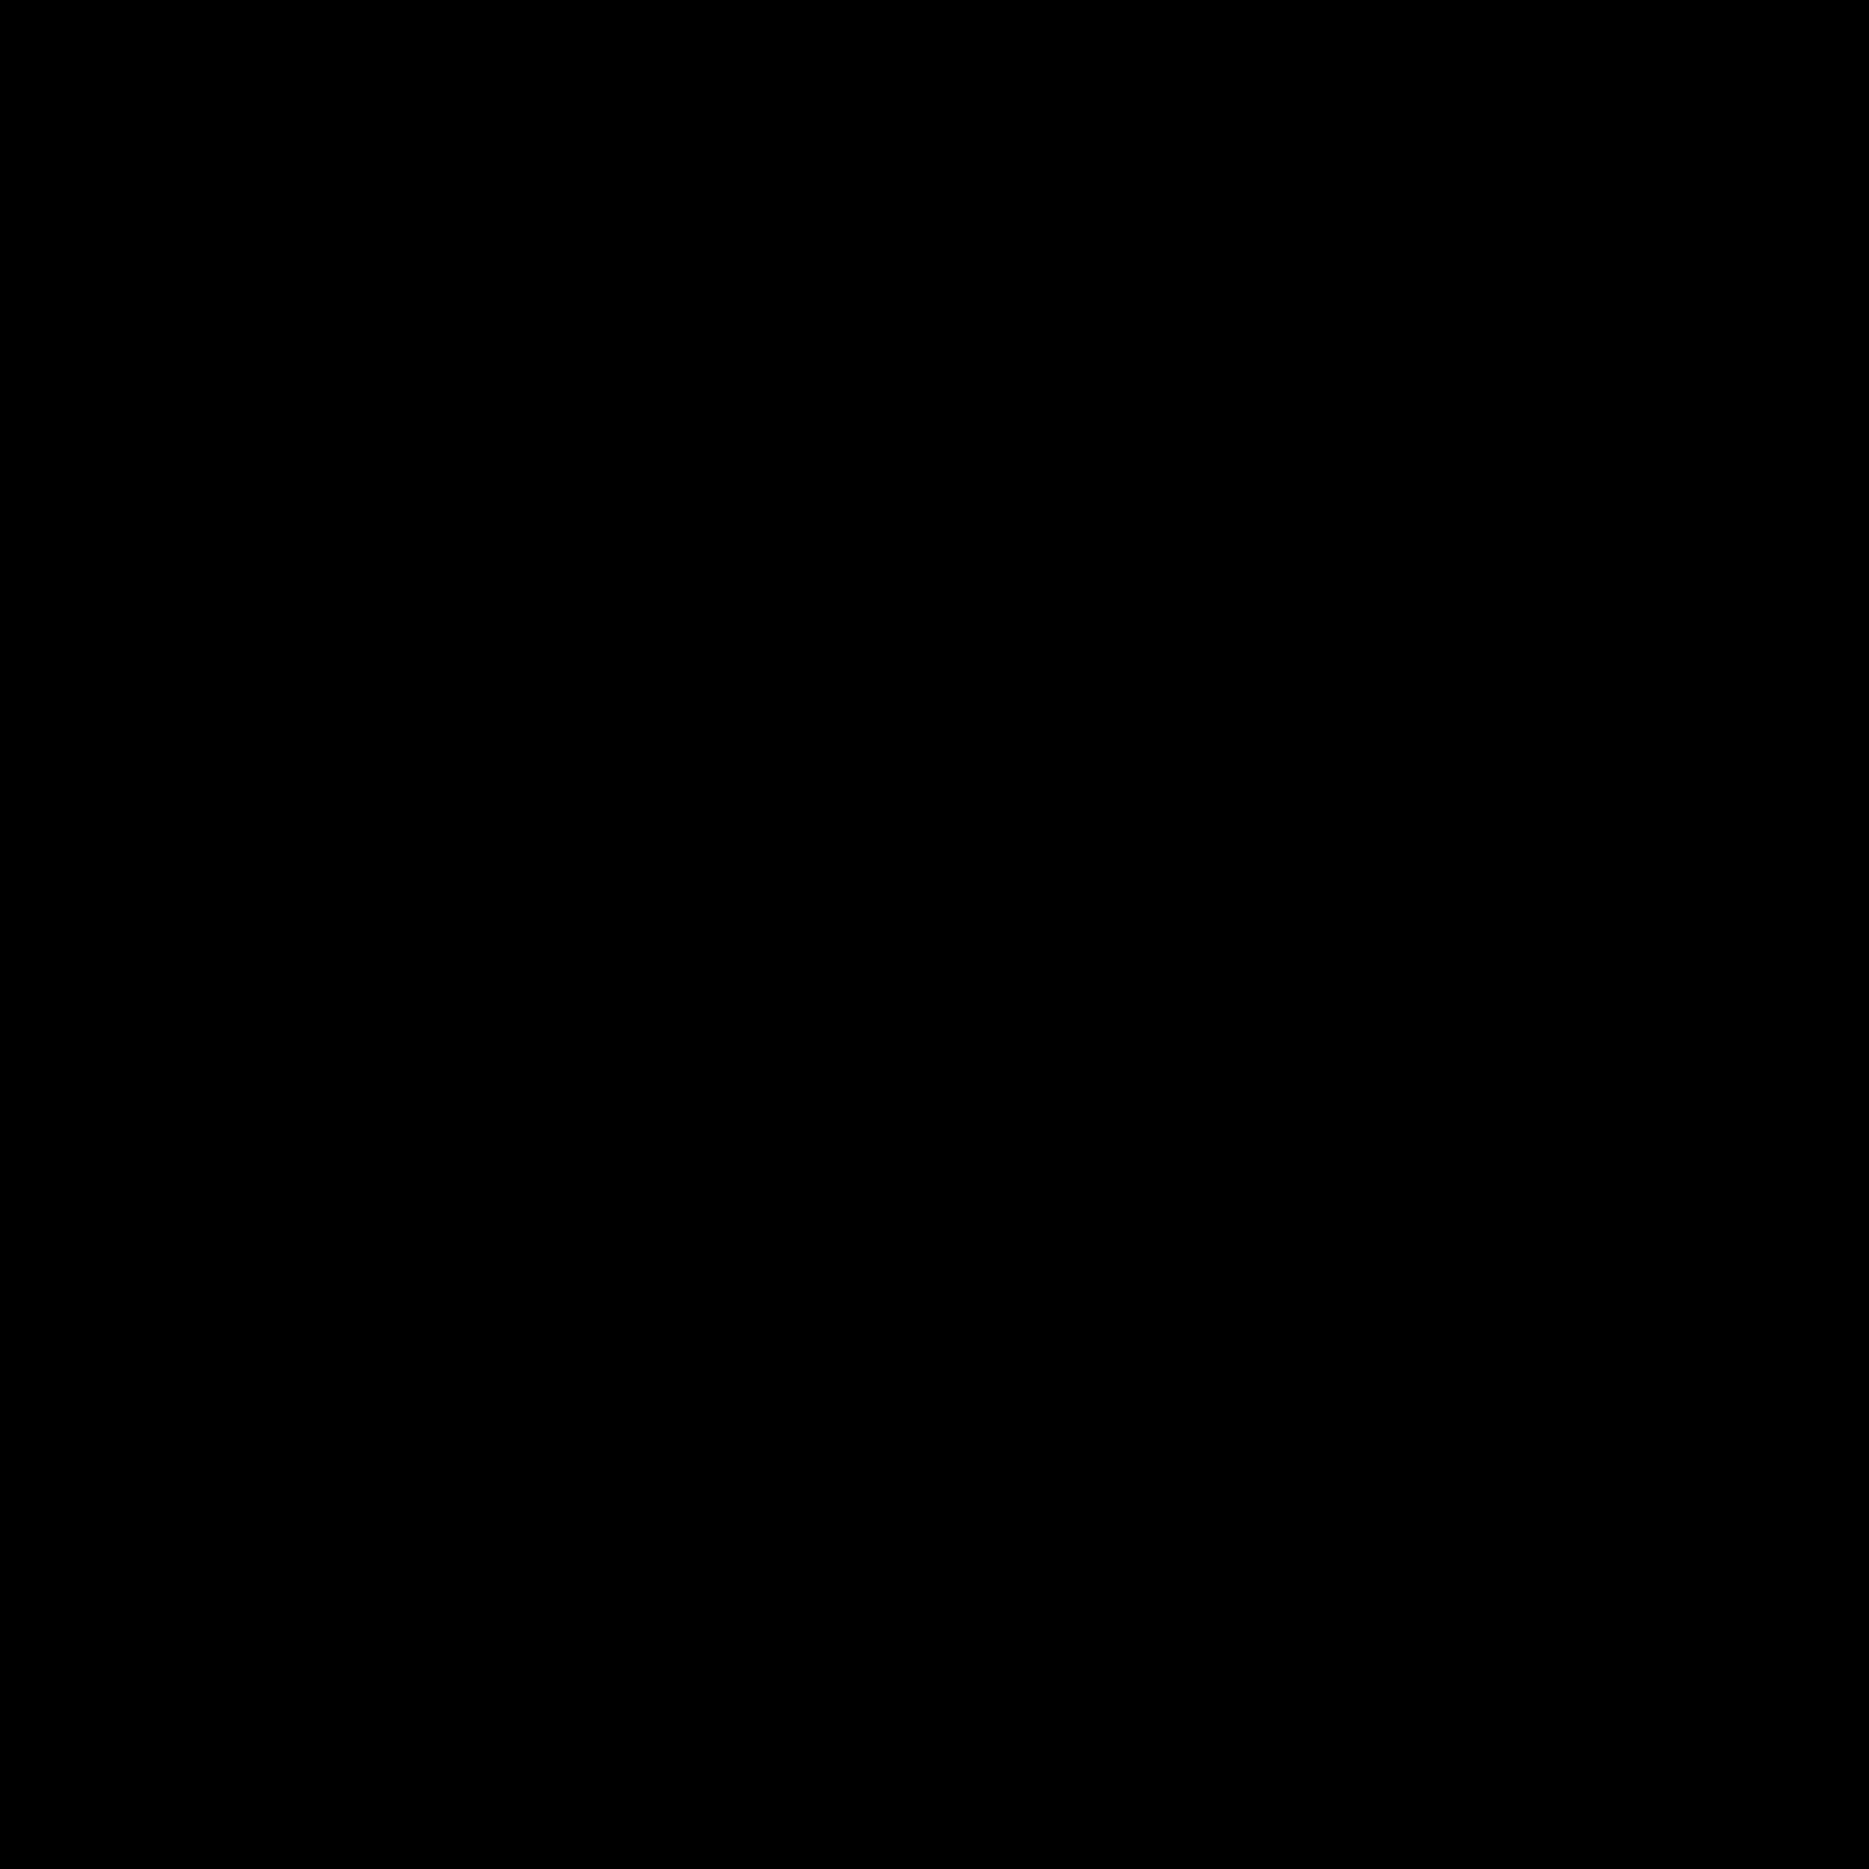 1869x1869 Black Bear Clipart Outline